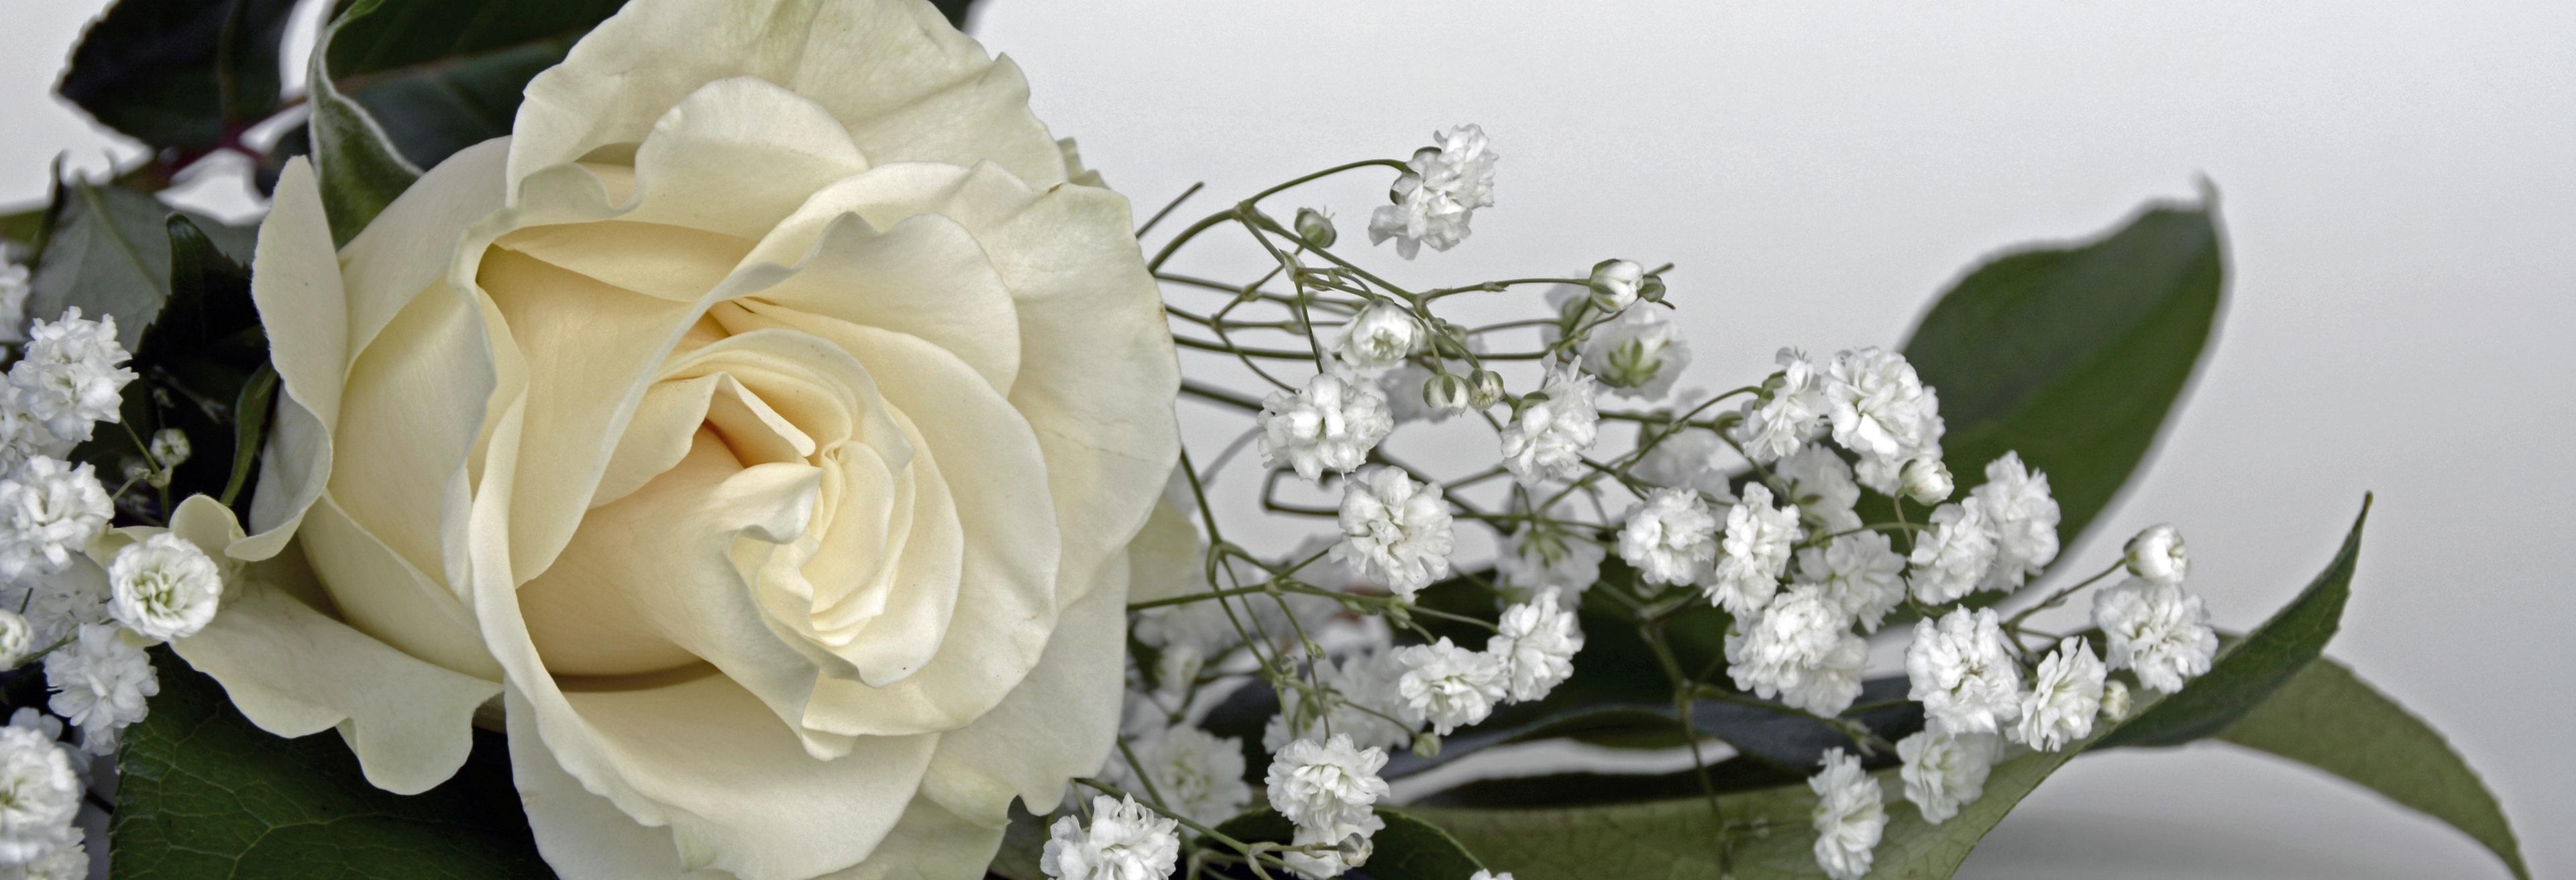 Free Images Nature Blossom White Petal Love Banner Romance